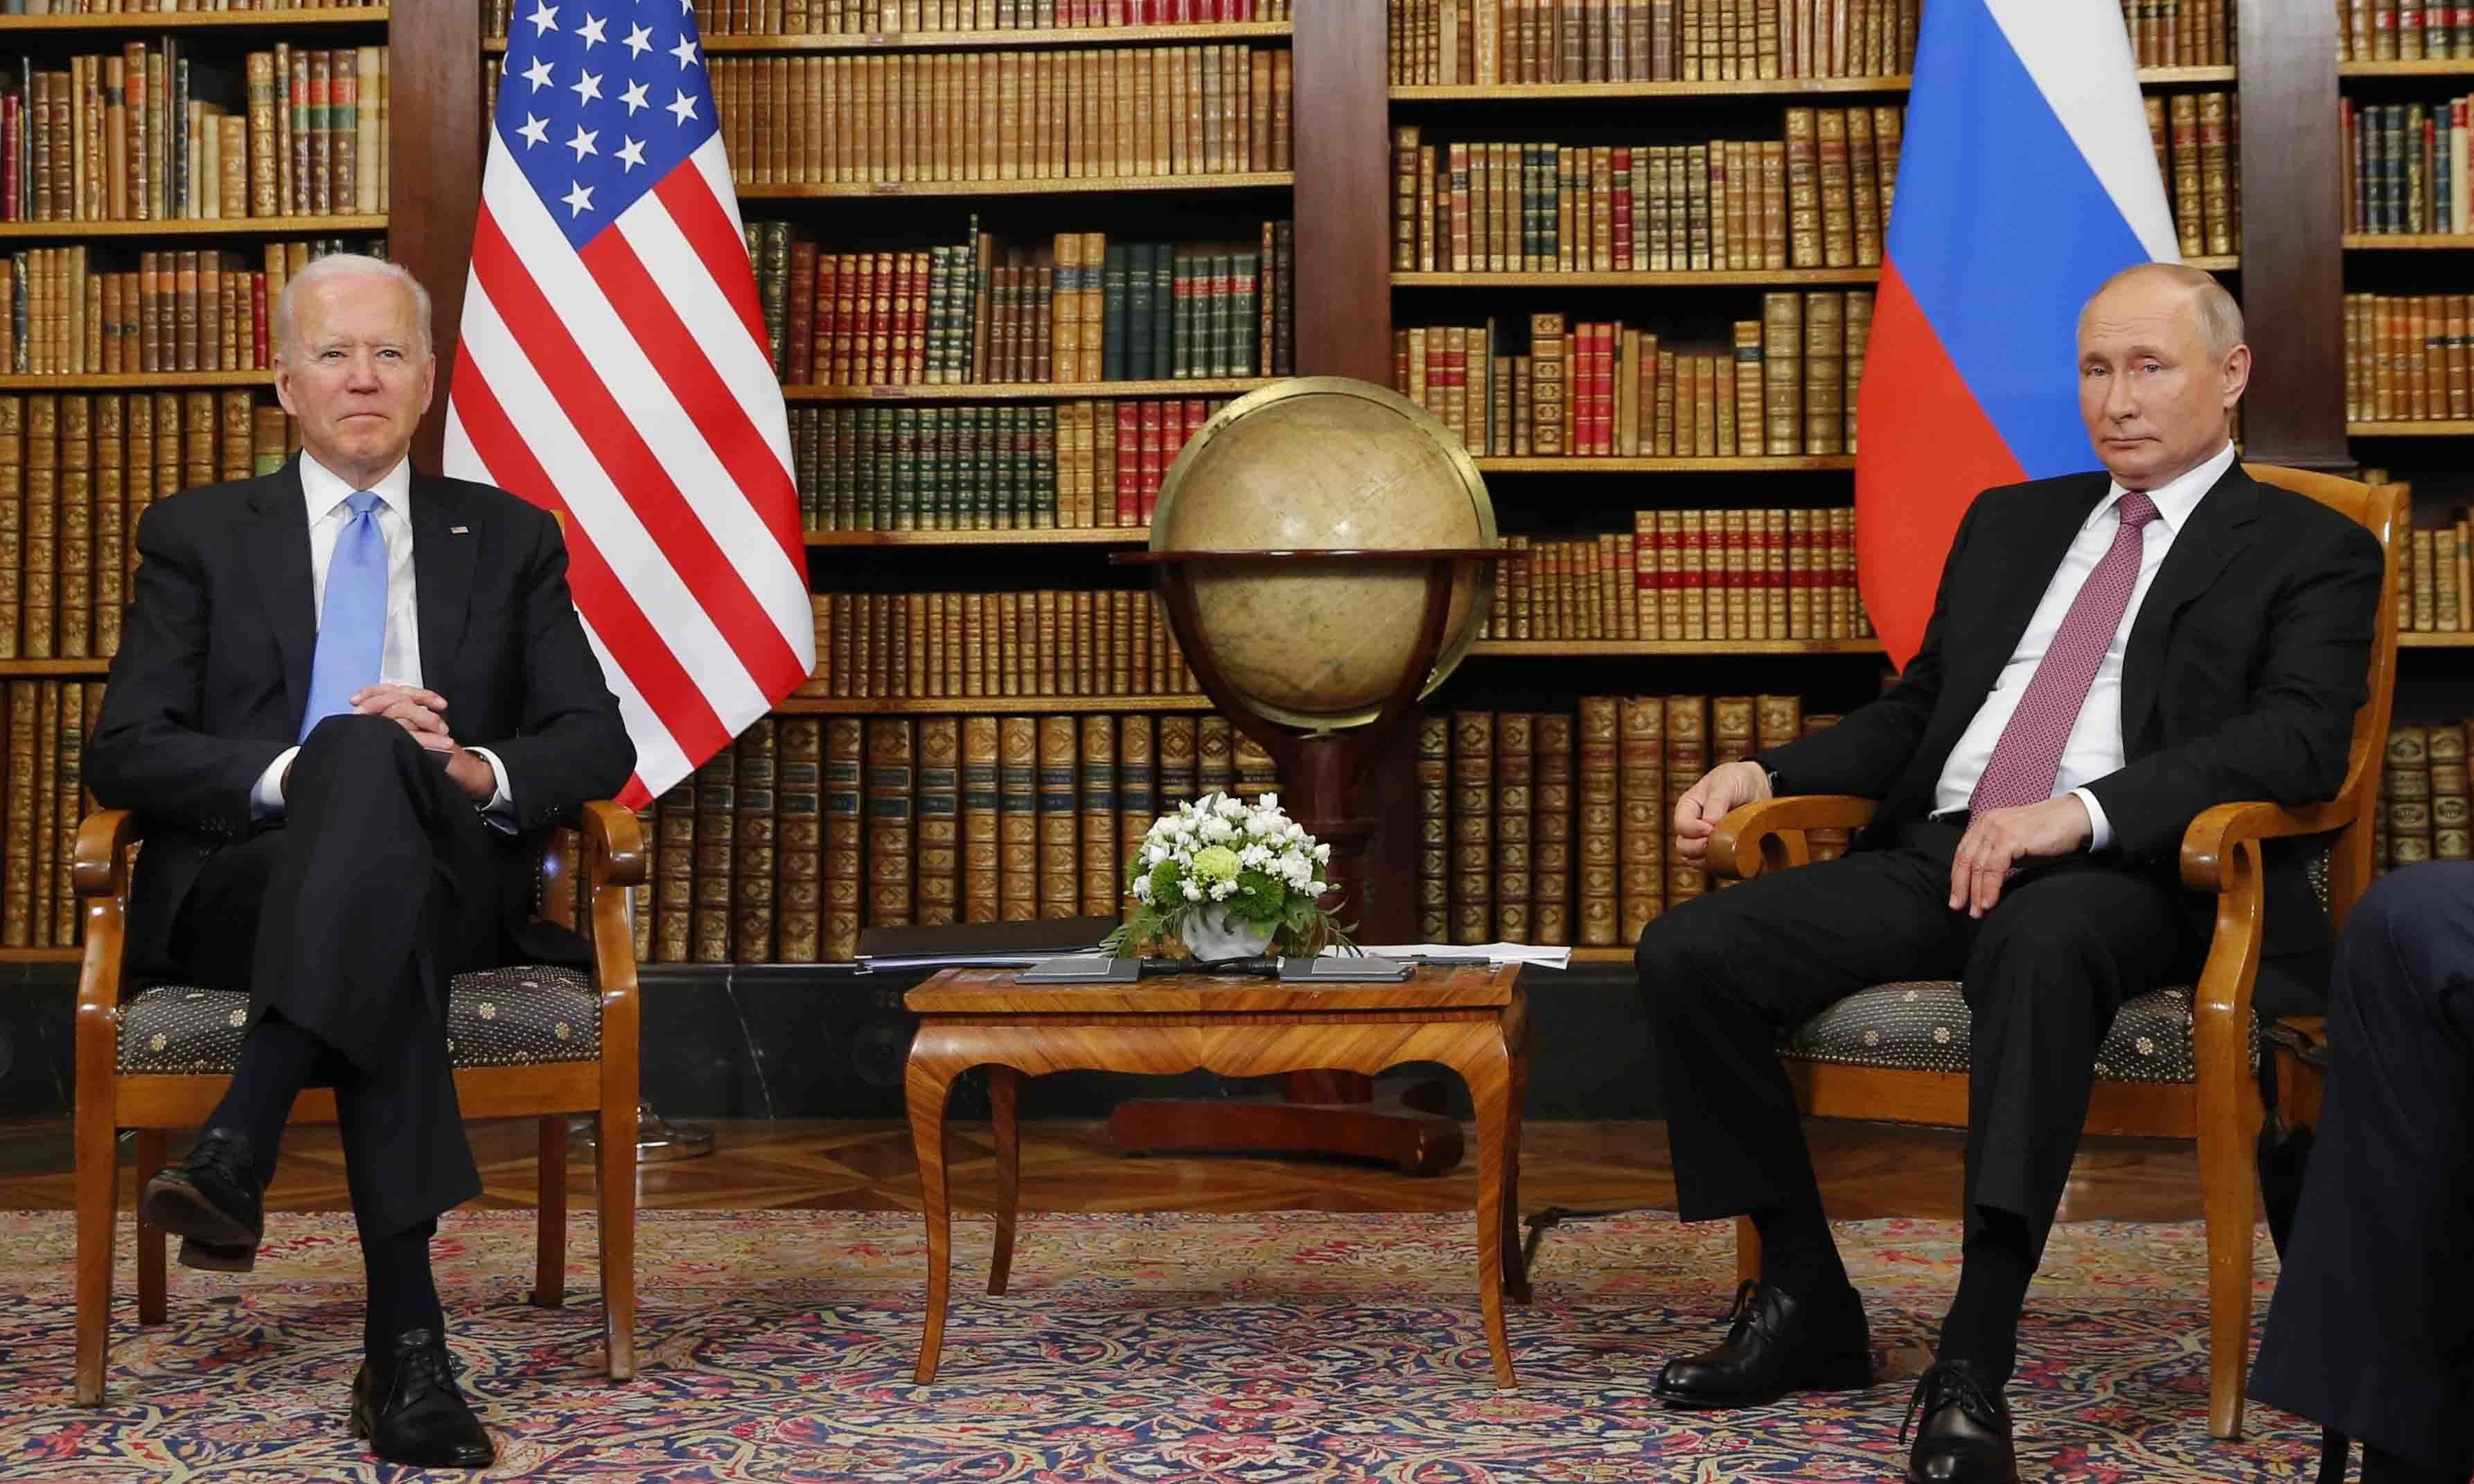 Putin, Biden meet in Geneva, agree to ambassadors' return